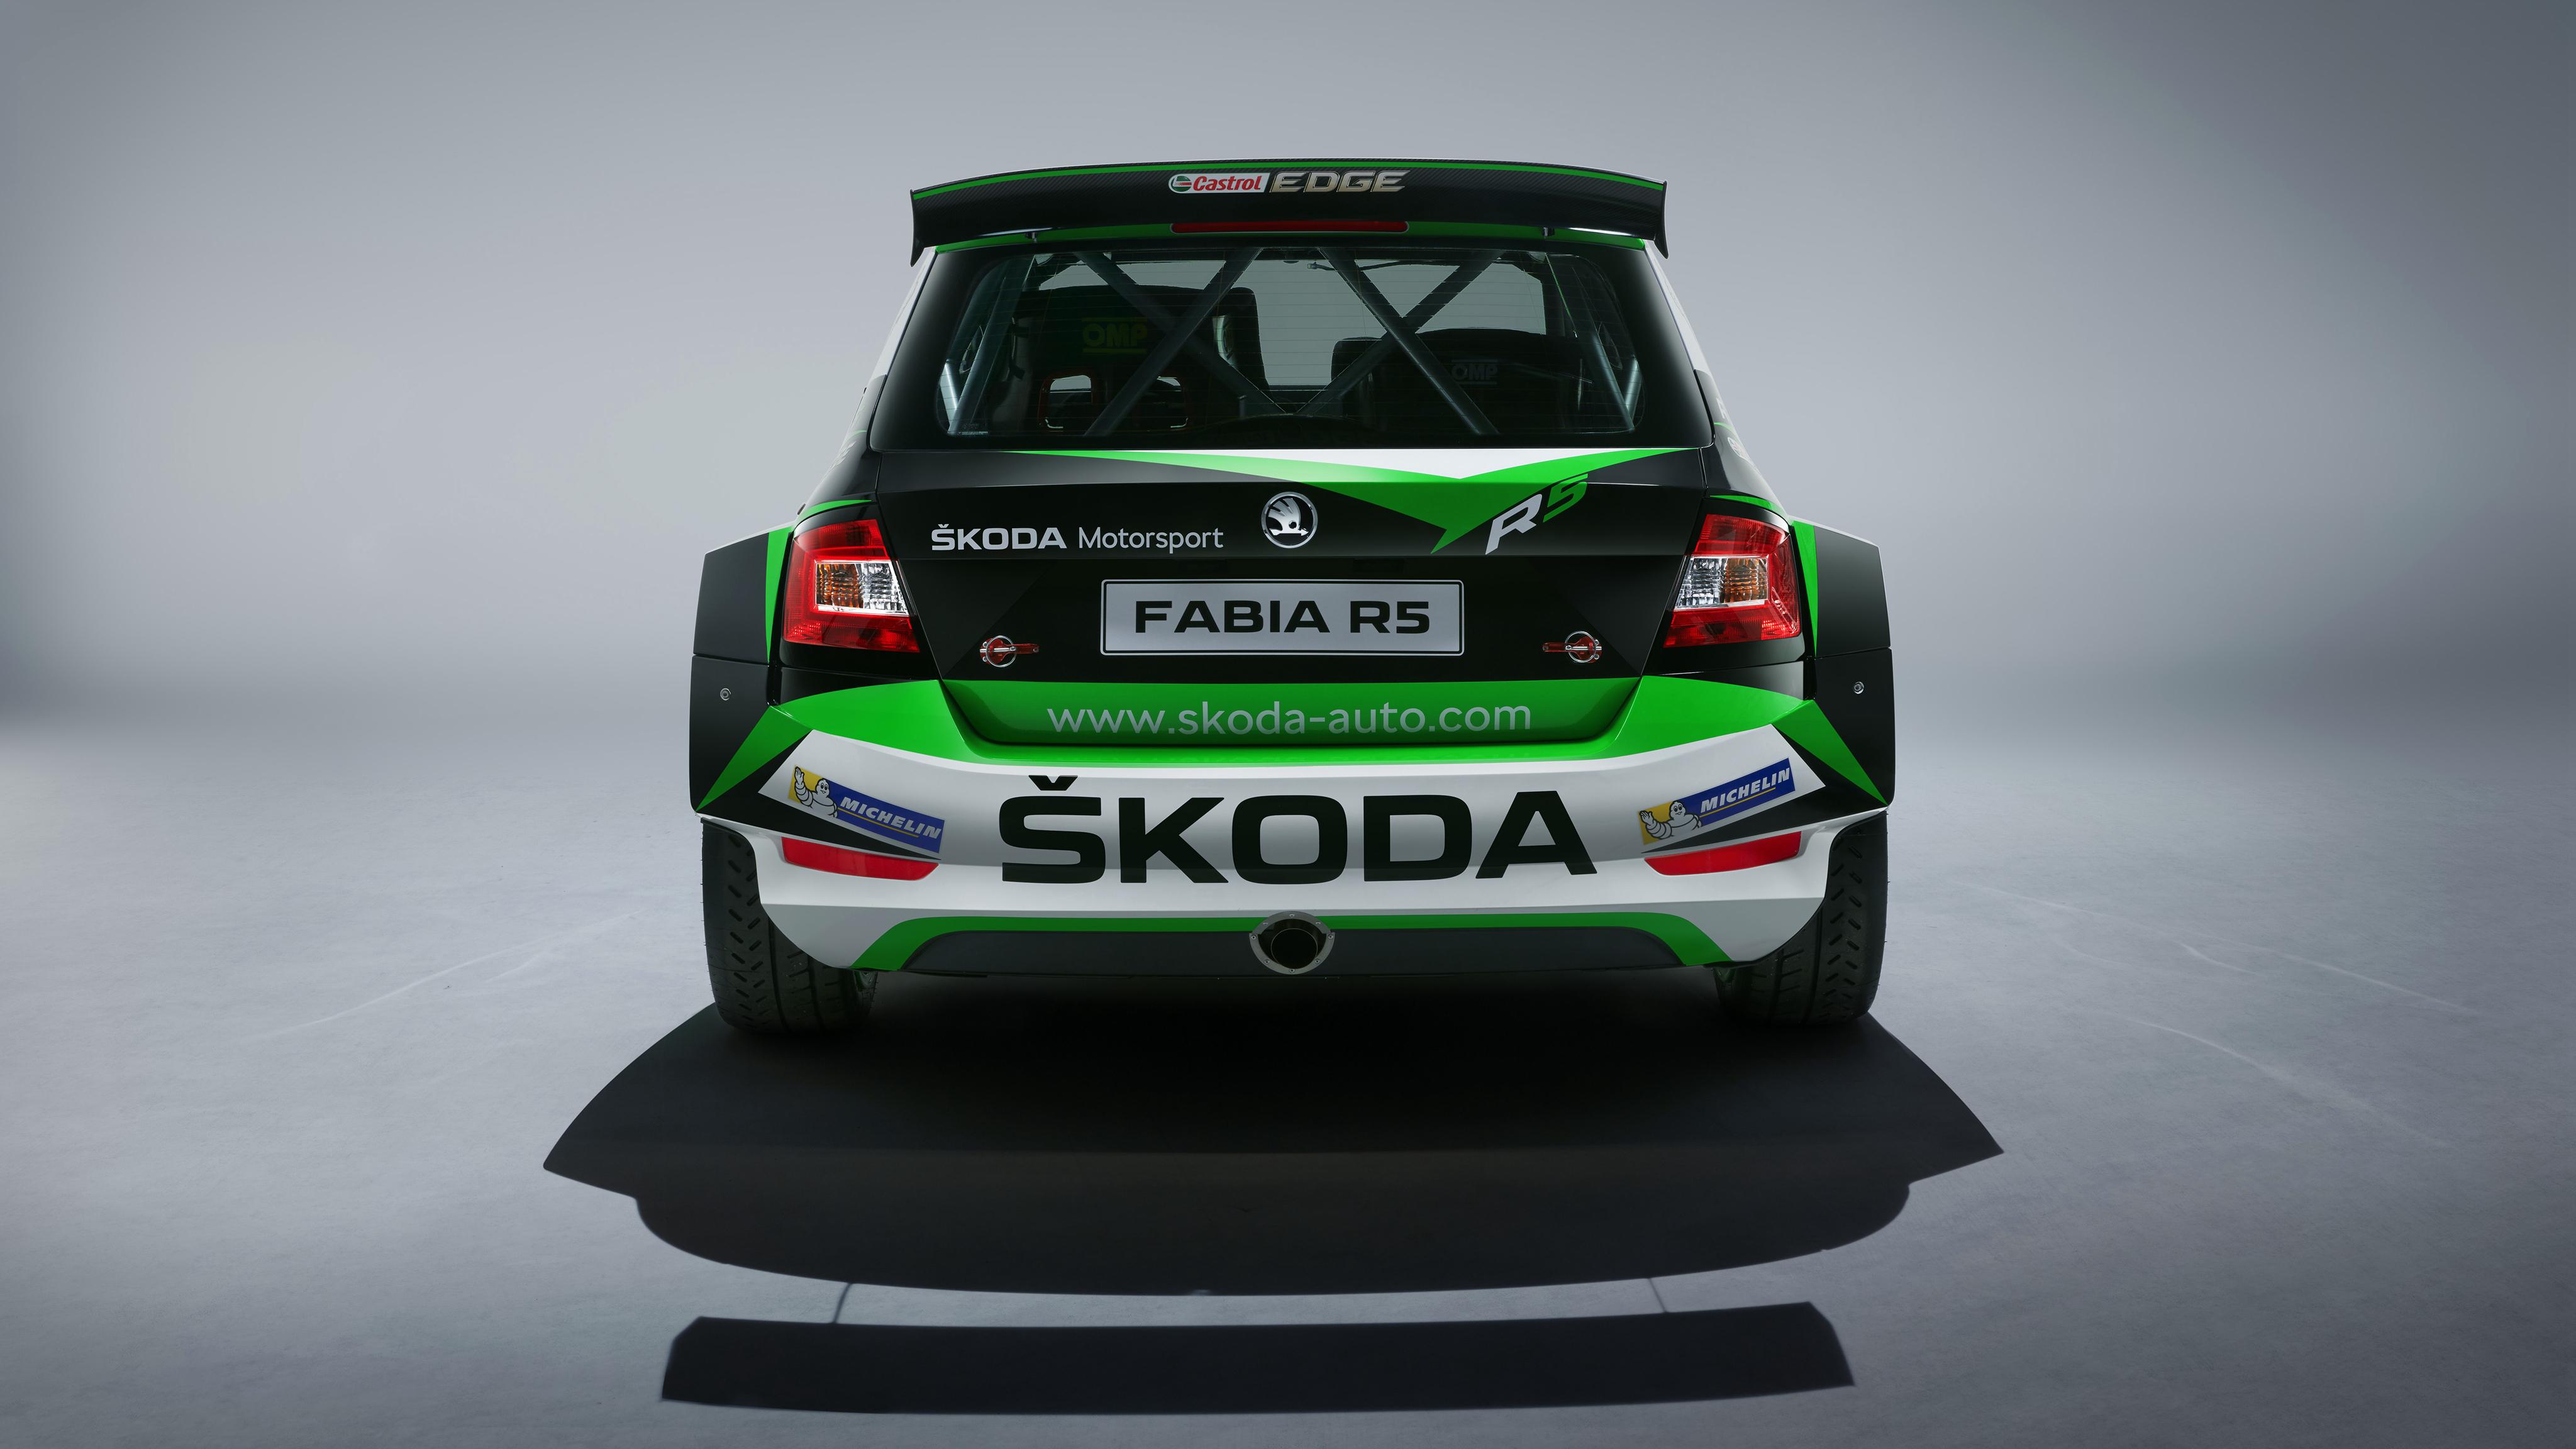 Skoda Fabia R5 Concept 4k 2019 2 Wallpaper Hd Car Wallpapers Id 11635